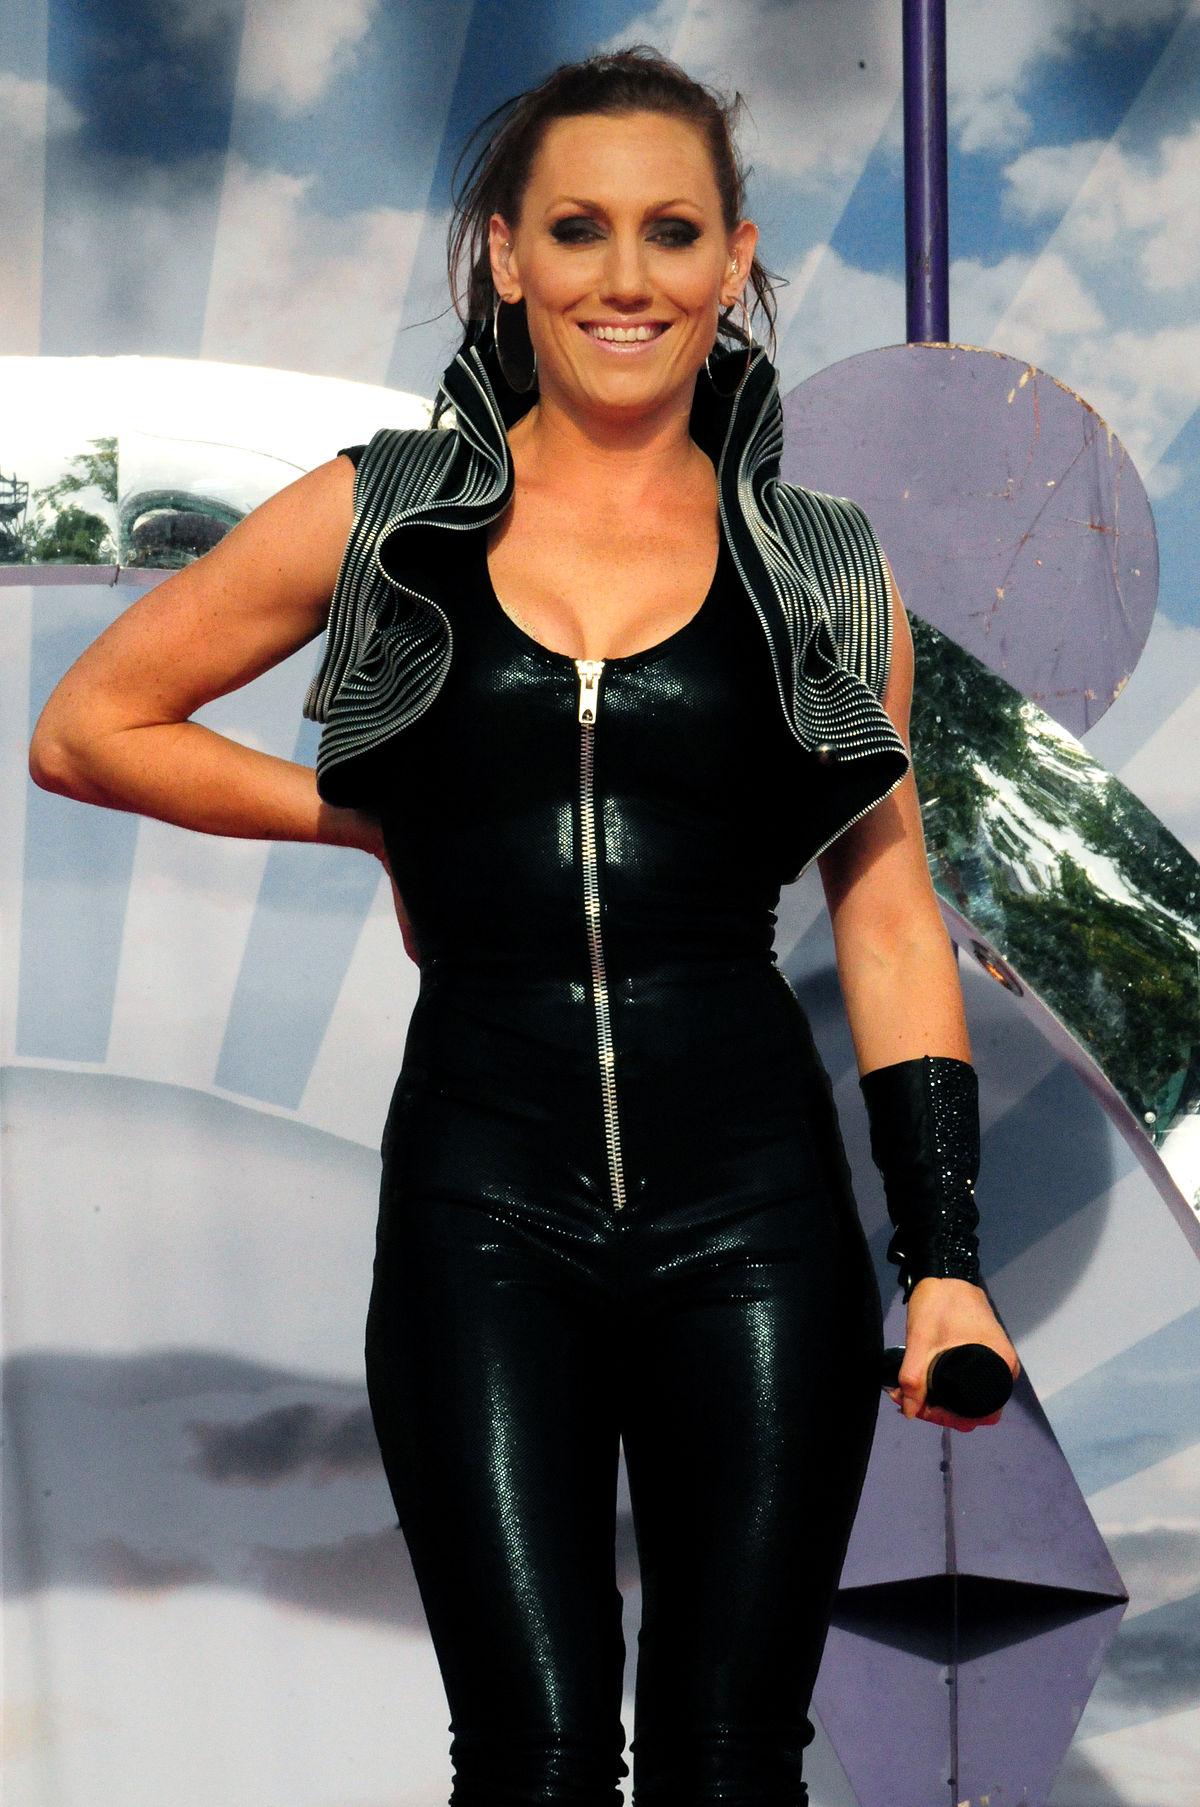 Lina Hedlund